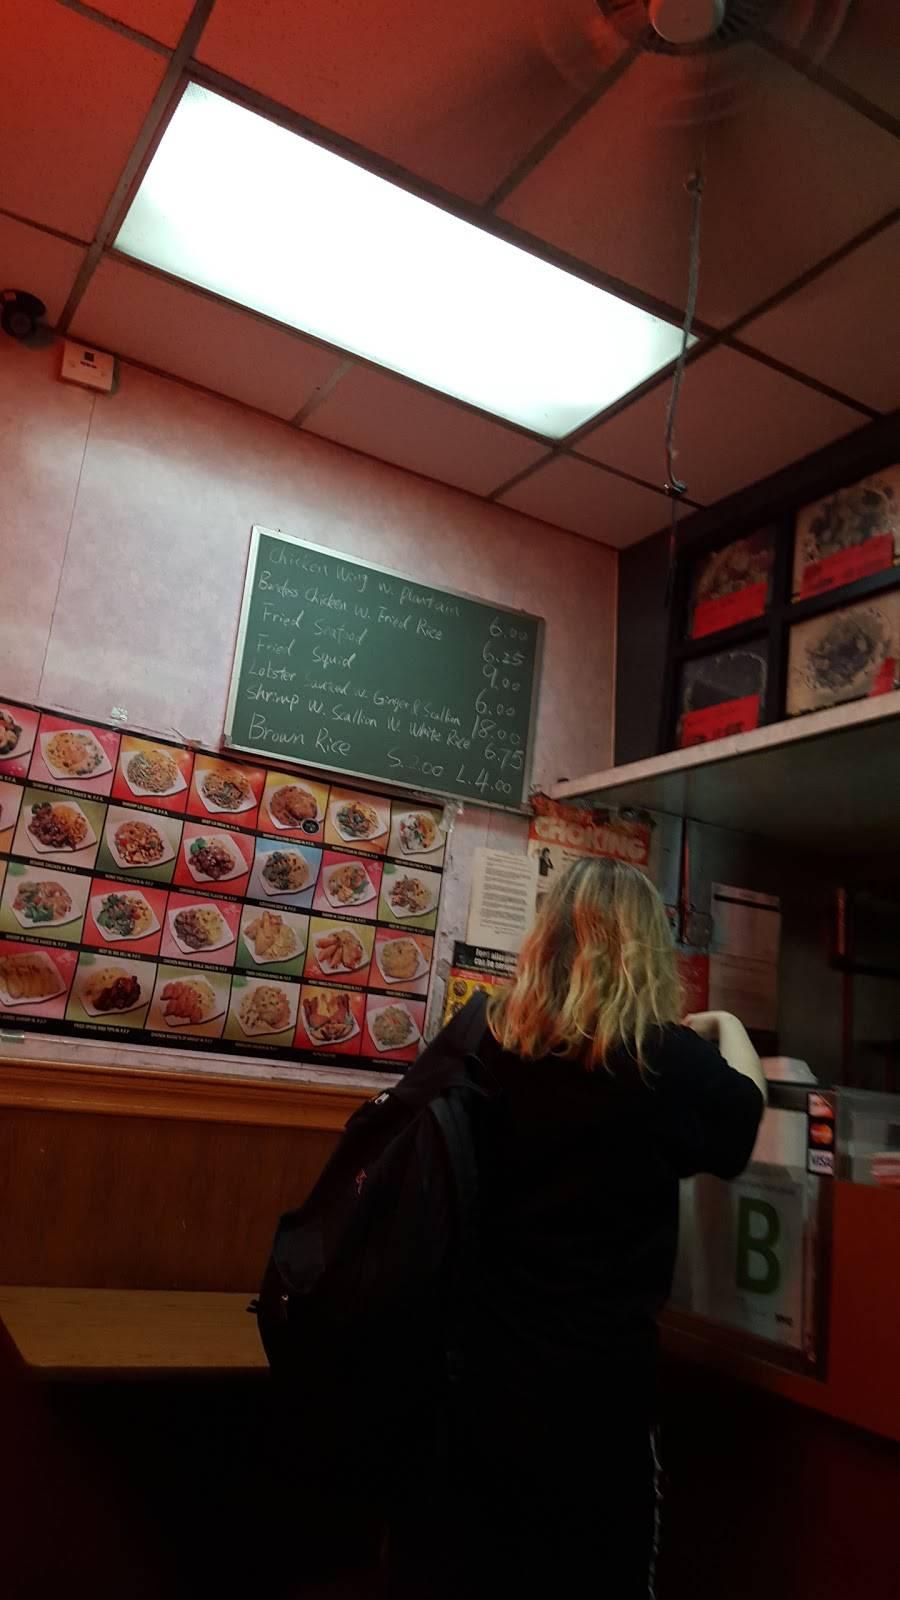 Li Hang Lung | restaurant | 1614 St Nicholas Ave, New York, NY 10040, USA | 2129271525 OR +1 212-927-1525